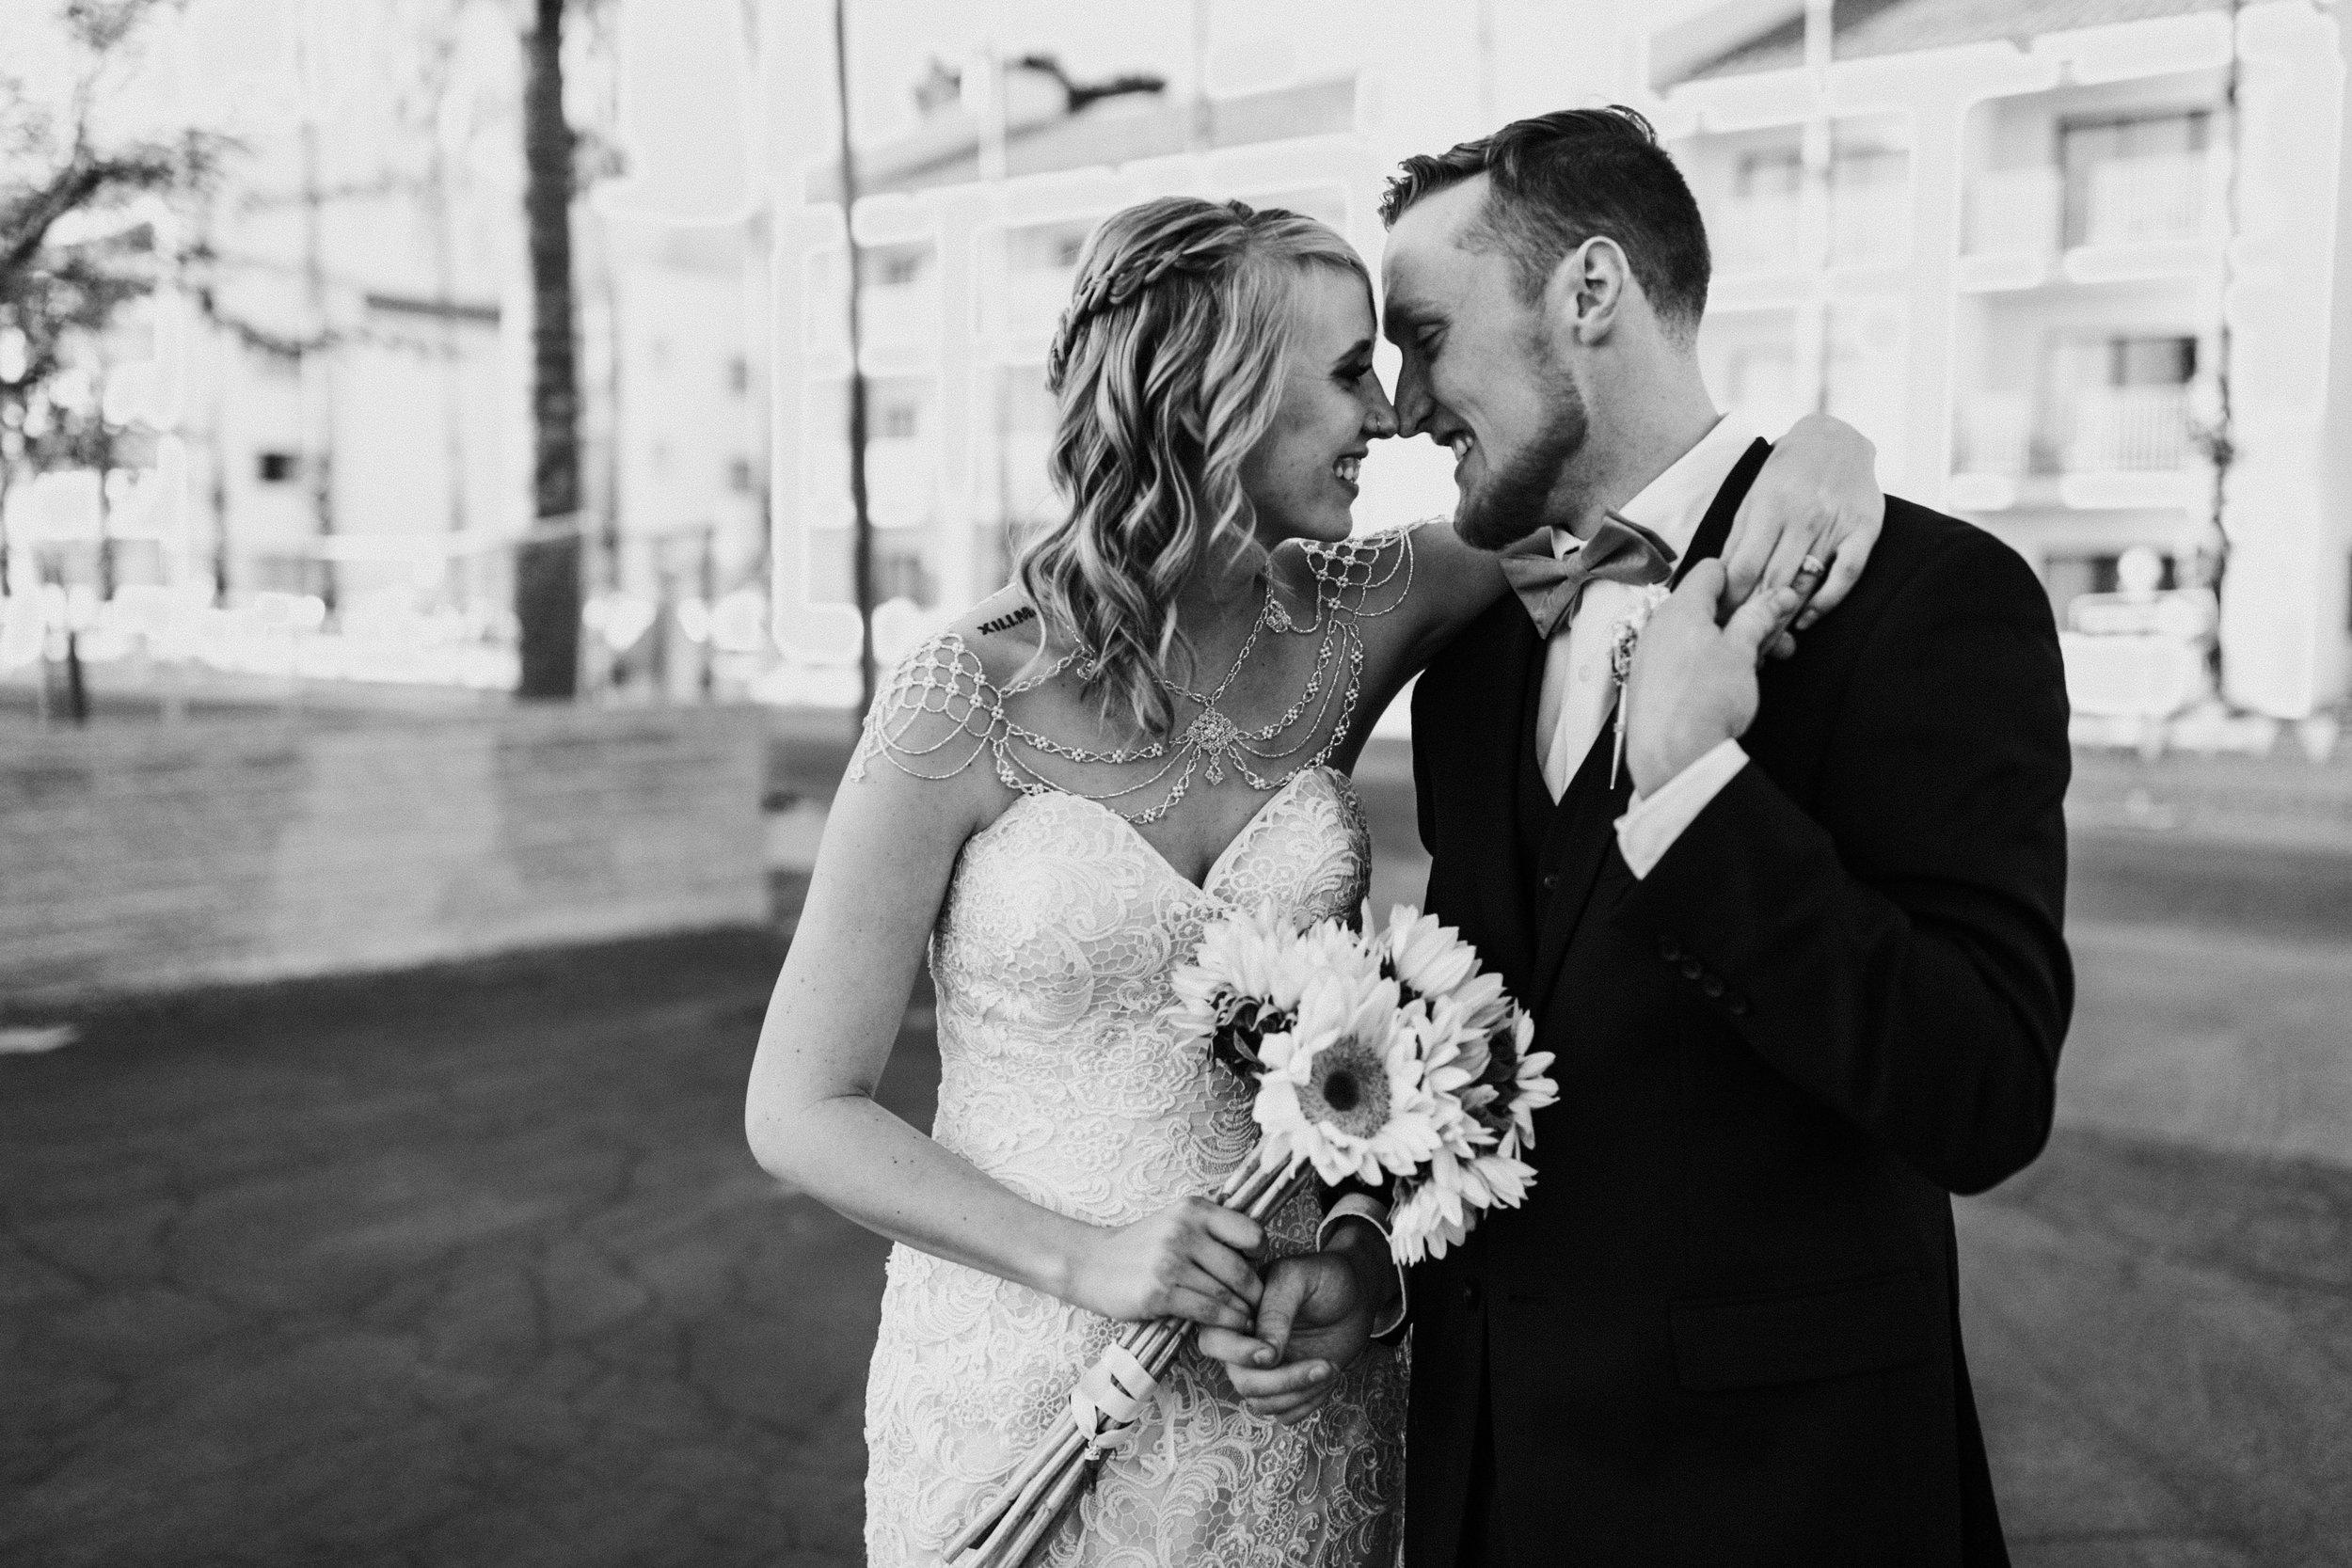 adventure-wedding-photographer-gracetphotography-39.jpg